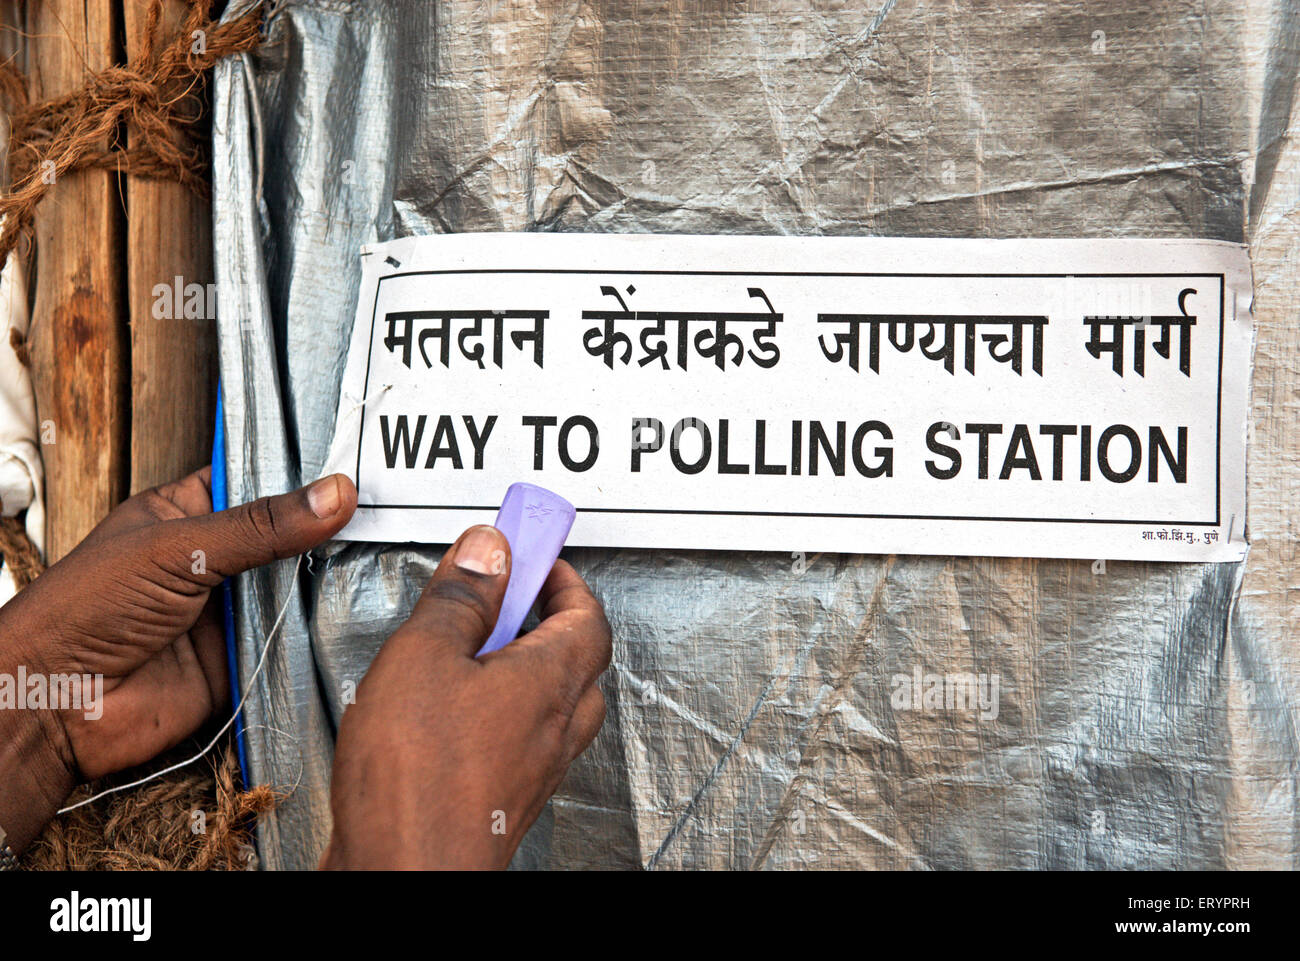 Officer staples istruzioni su stand per sondaggi in Mumbai Bombay ; Maharashtra ; India 29 Aprile 2009 Immagini Stock